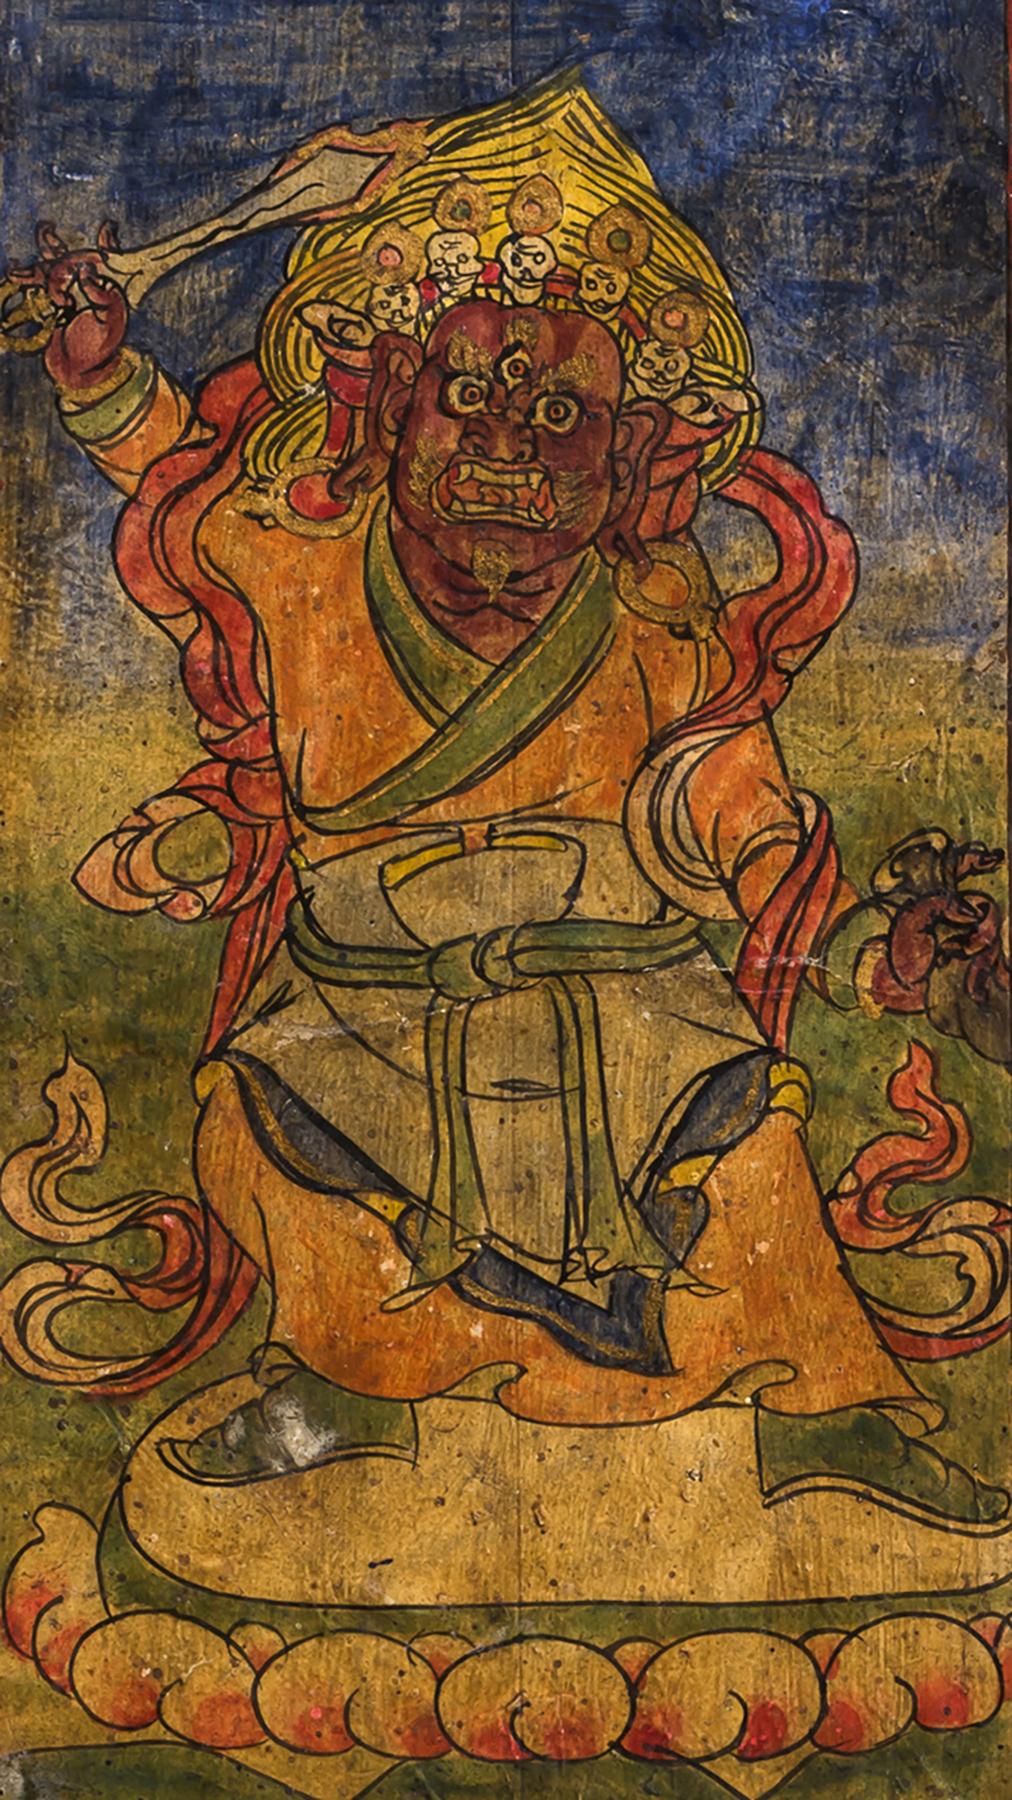 Pair of Large Buddhist Tsakli Painting Bhutan